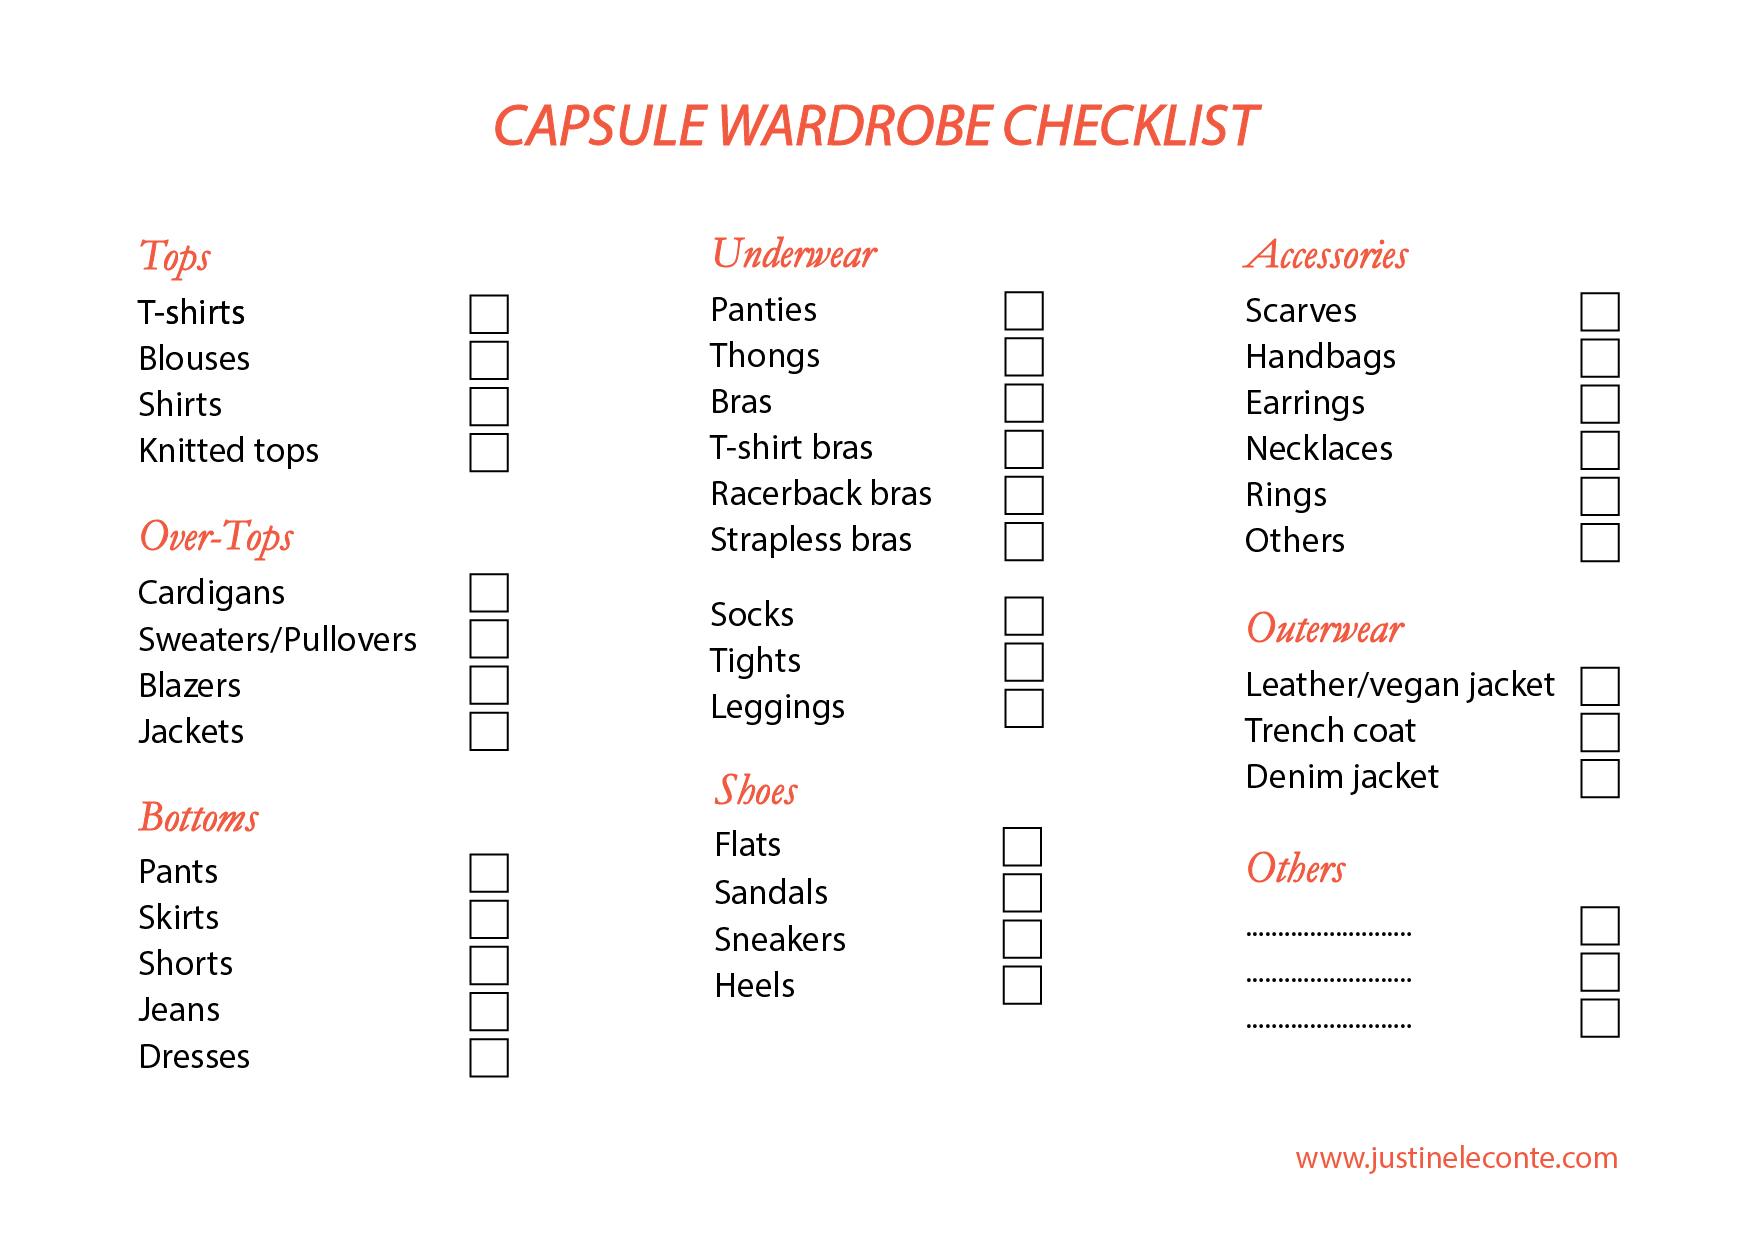 Checklist capsule wardrobe_JustineLeconte_blank.jpg